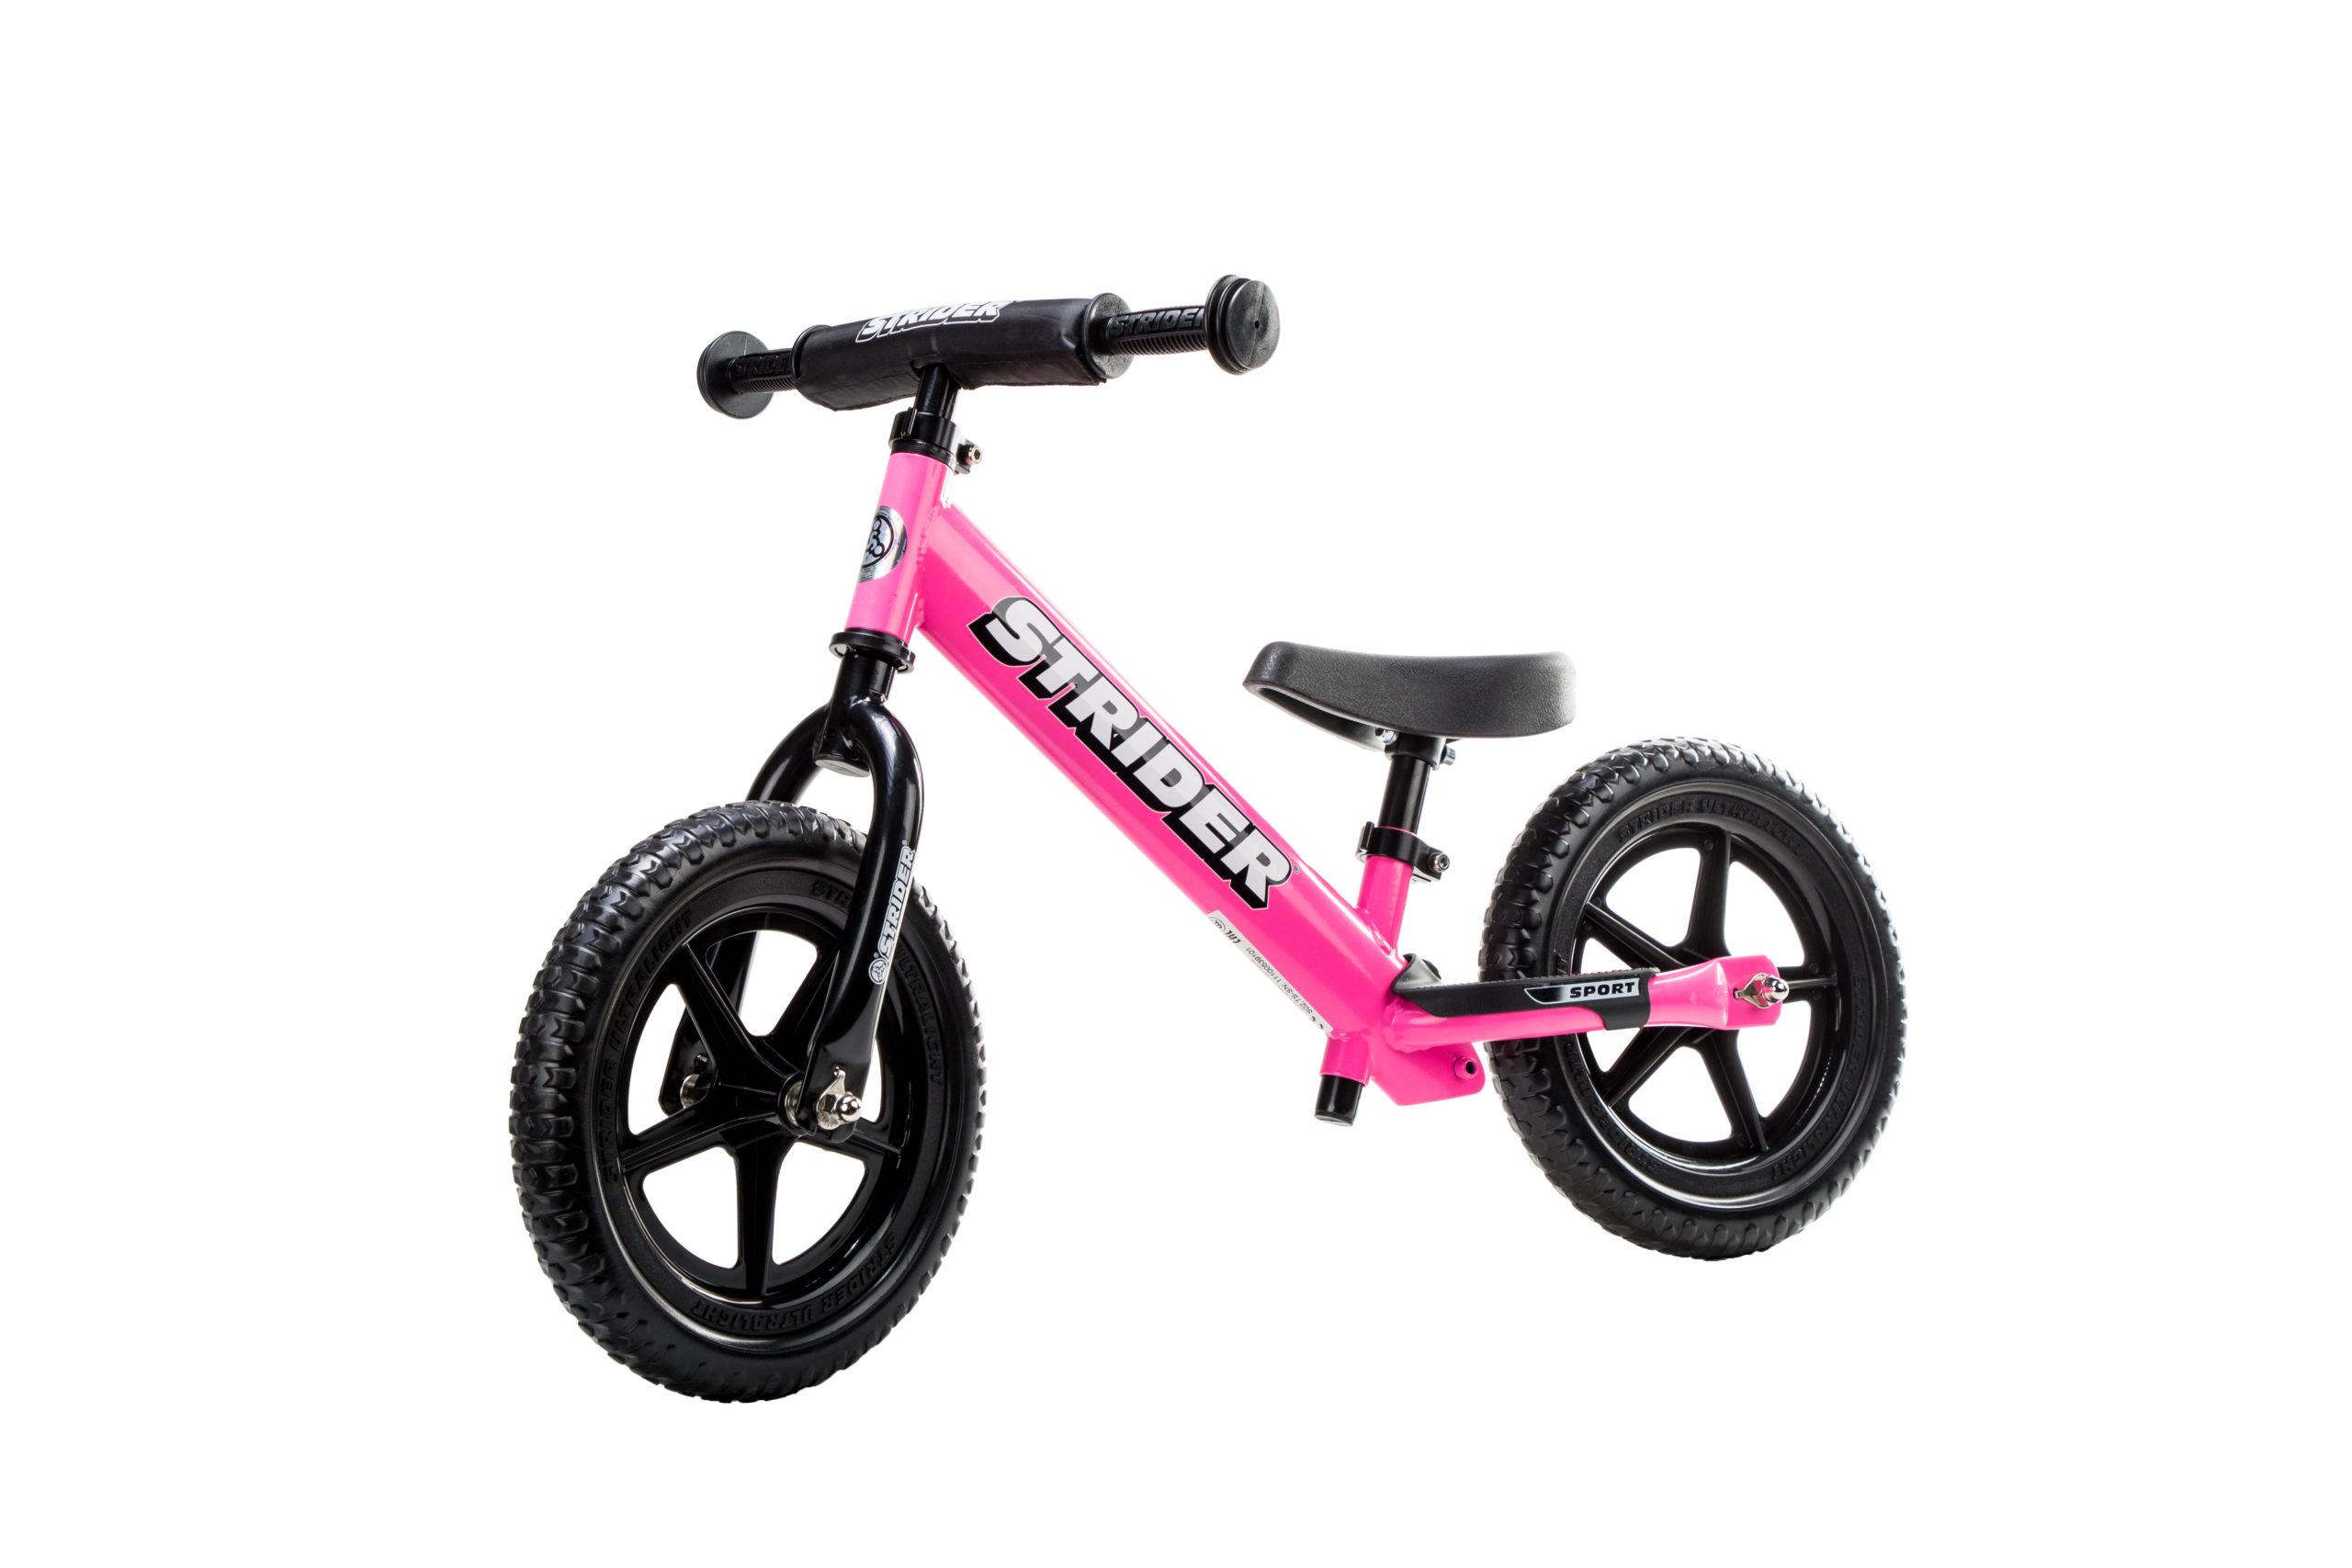 Studio image of Pink 12 Sport bike at angle